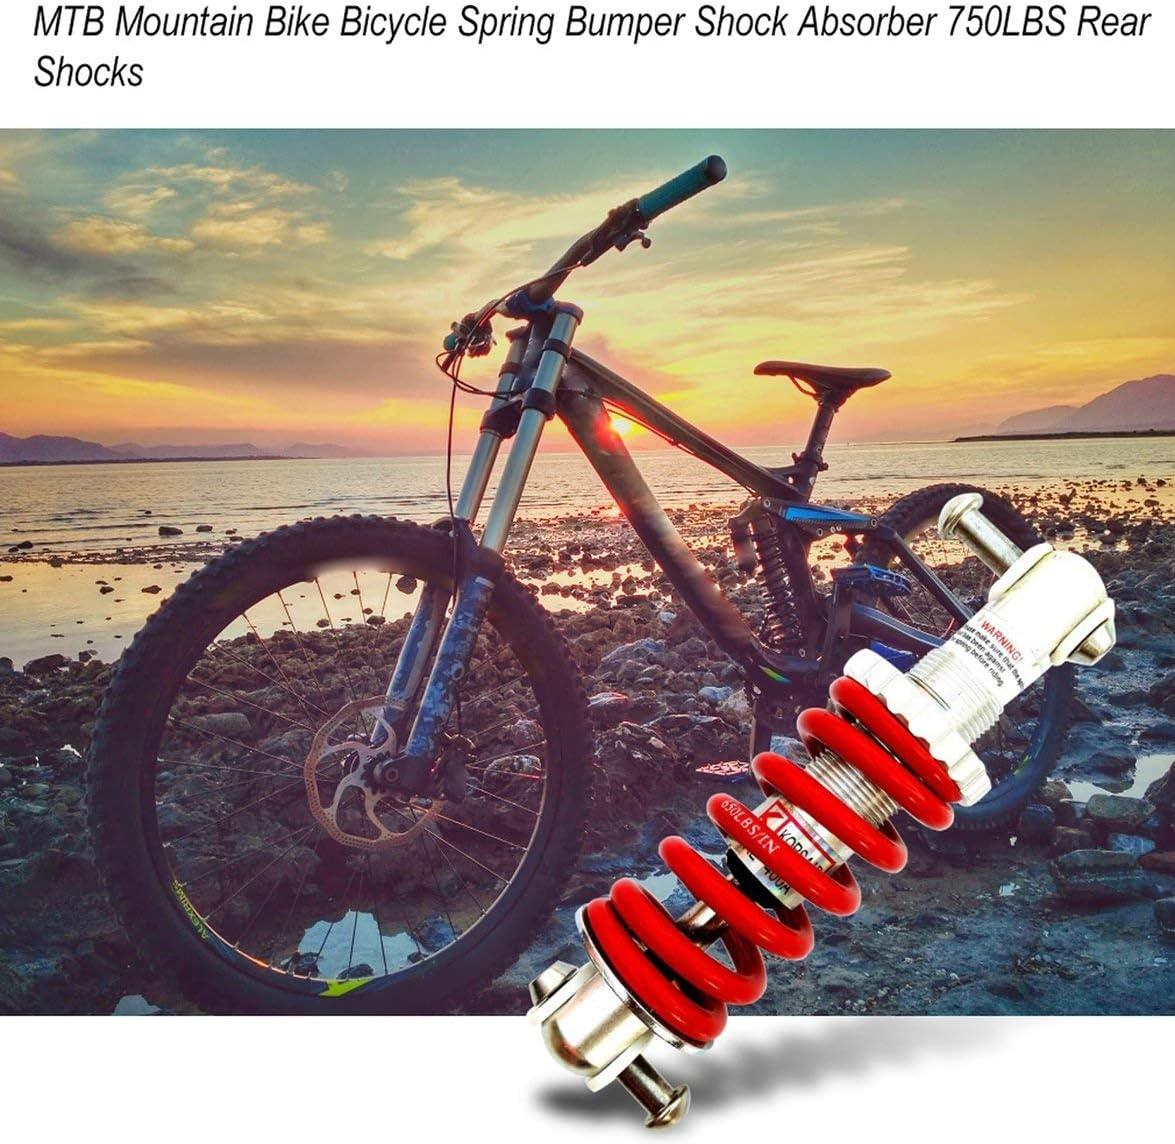 Bicycle Shock Absorber Bike spring Rear Shock for MTB Folding Bike Electric Bicy